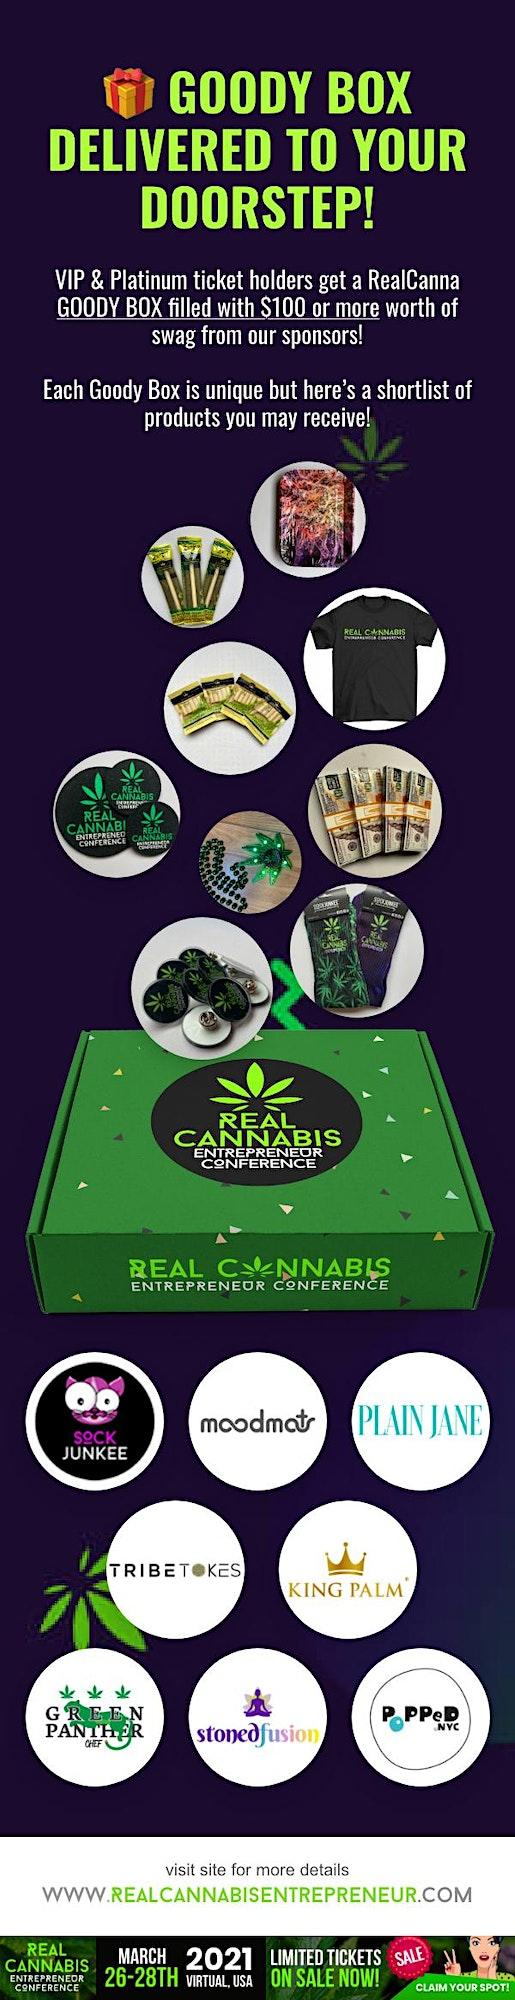 Real Cannabis Entrepreneur Virtual Conference NJ 2021 image